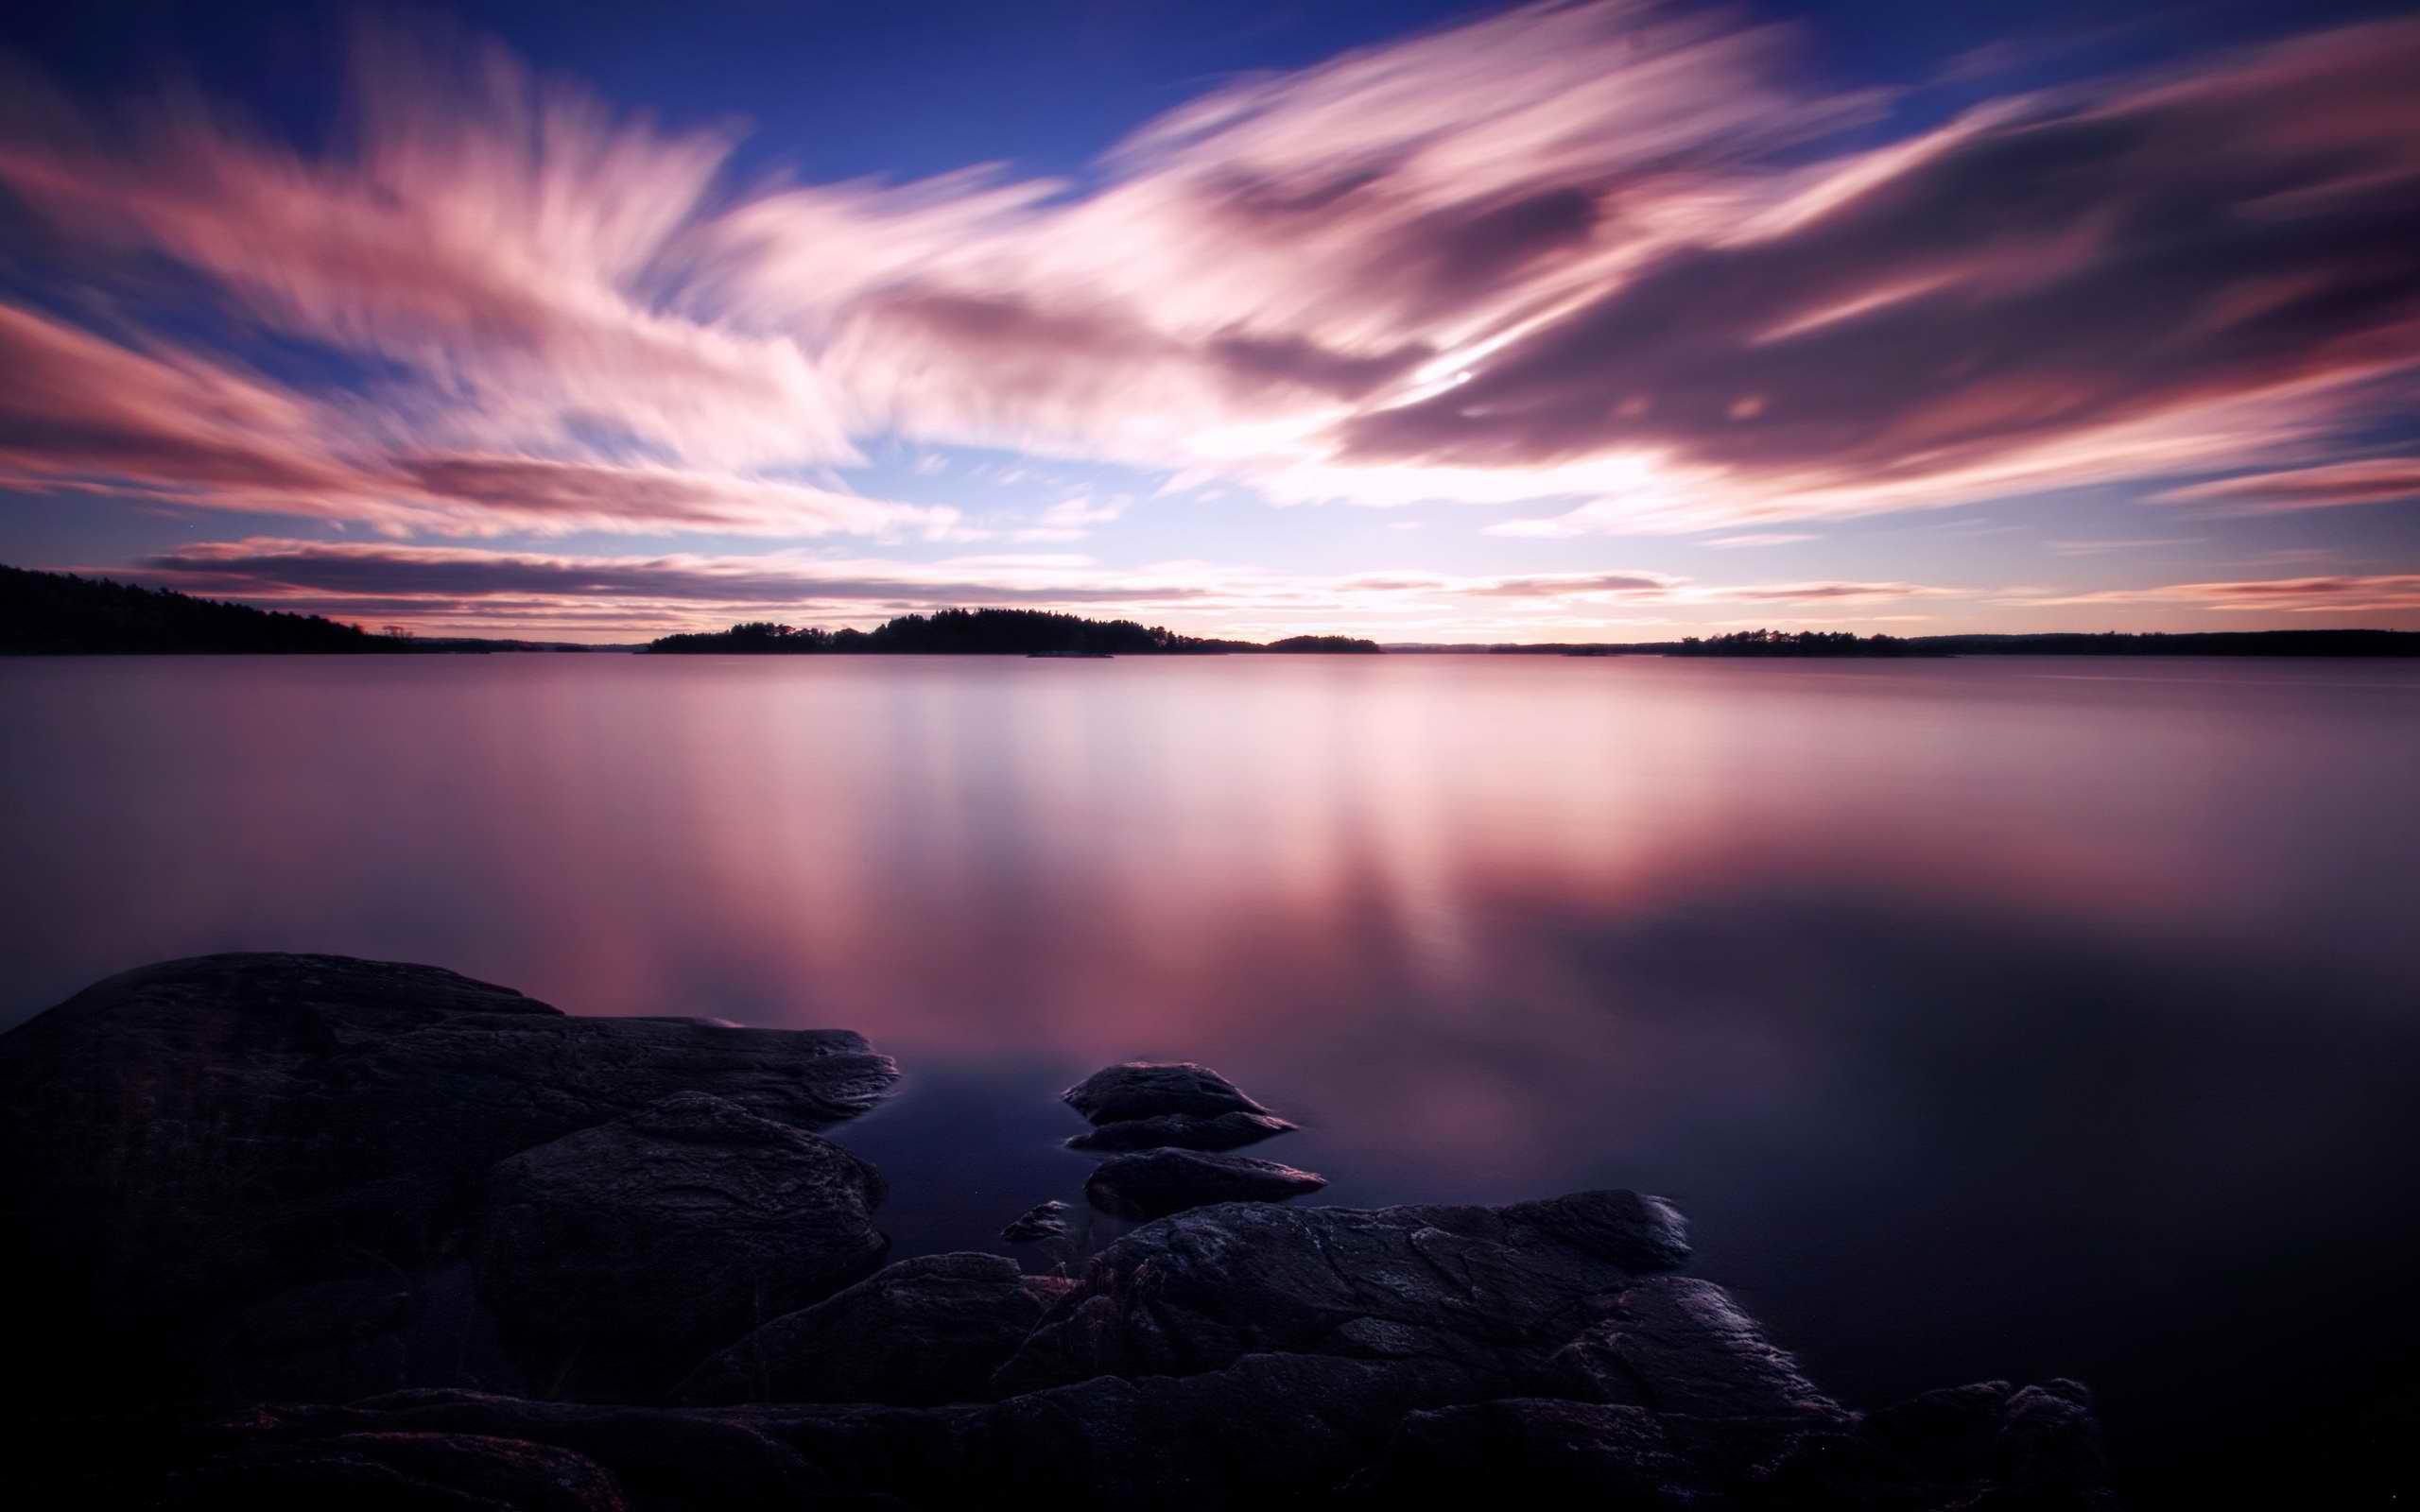 purple sunset wallpaper nature